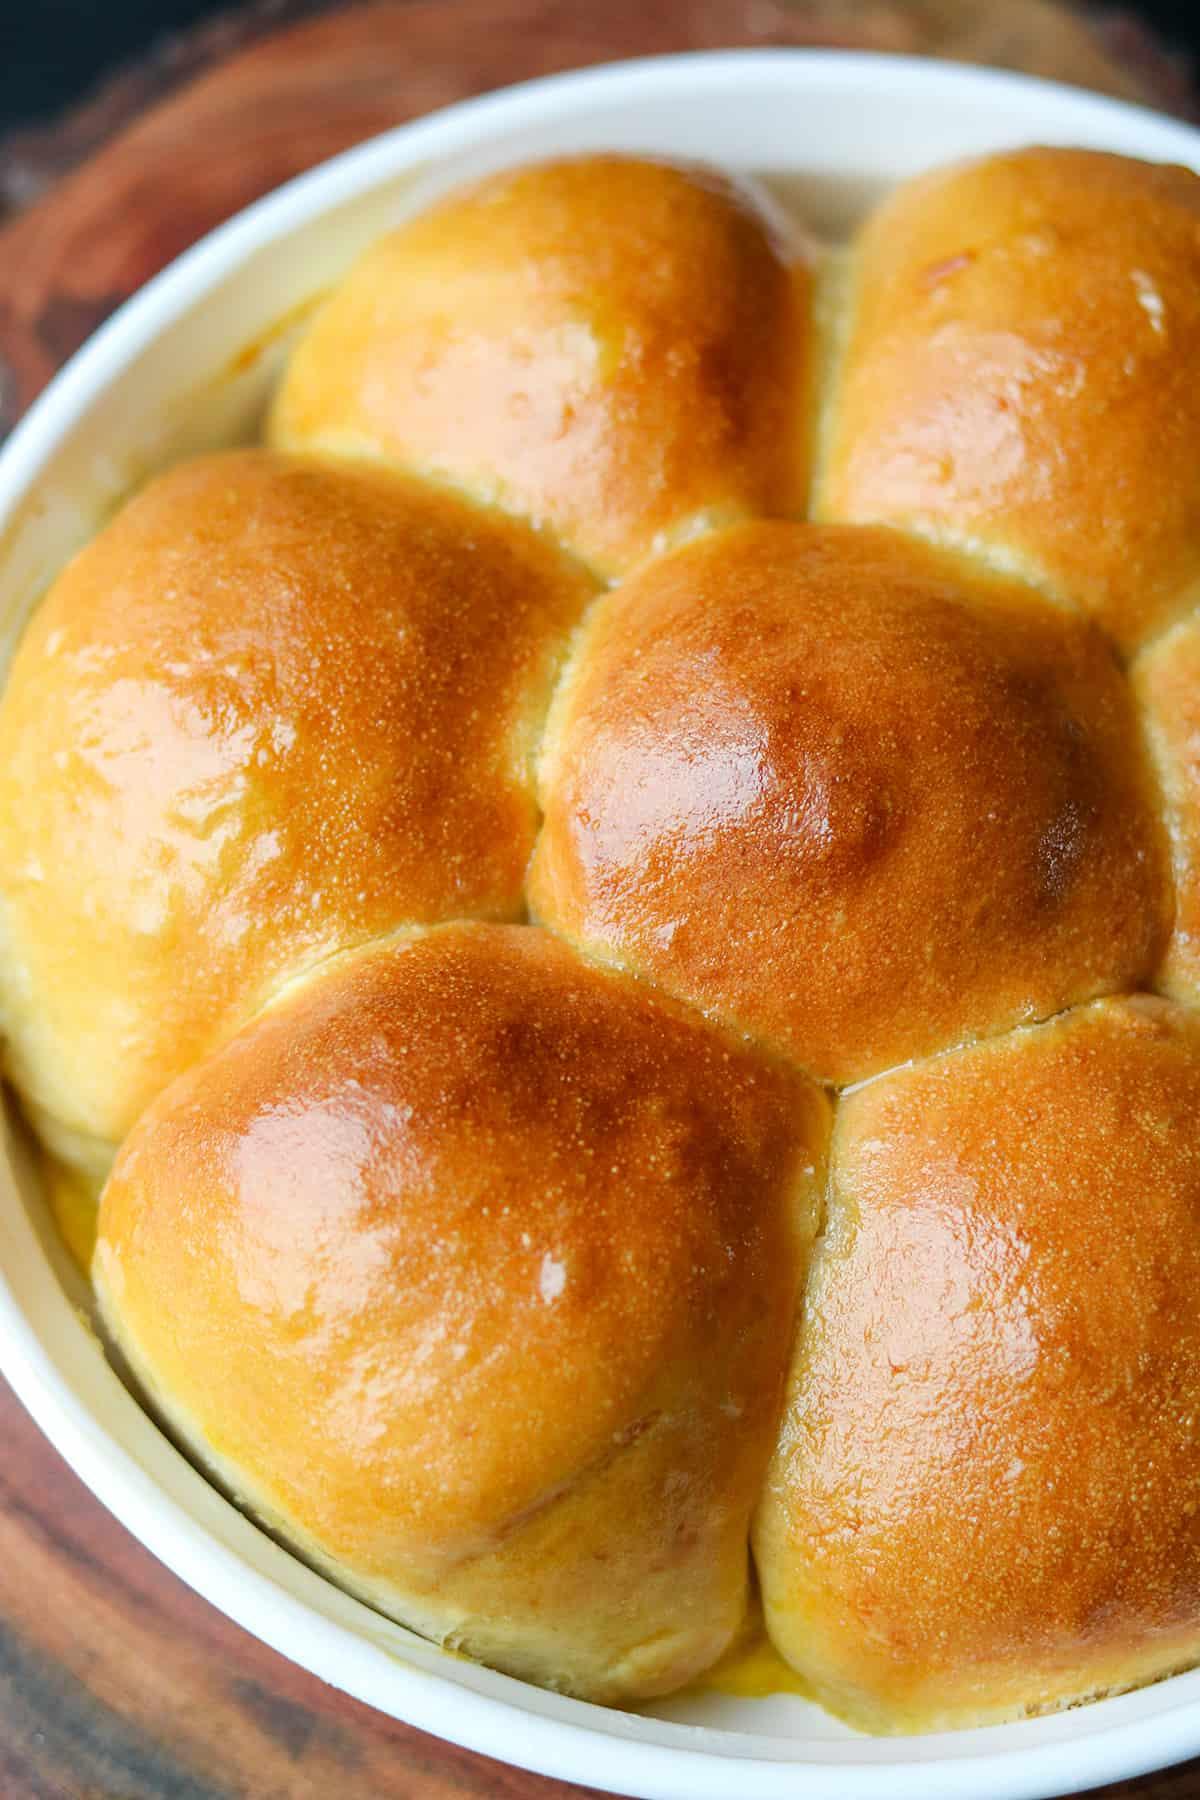 Baked Milk buns in white baking dish